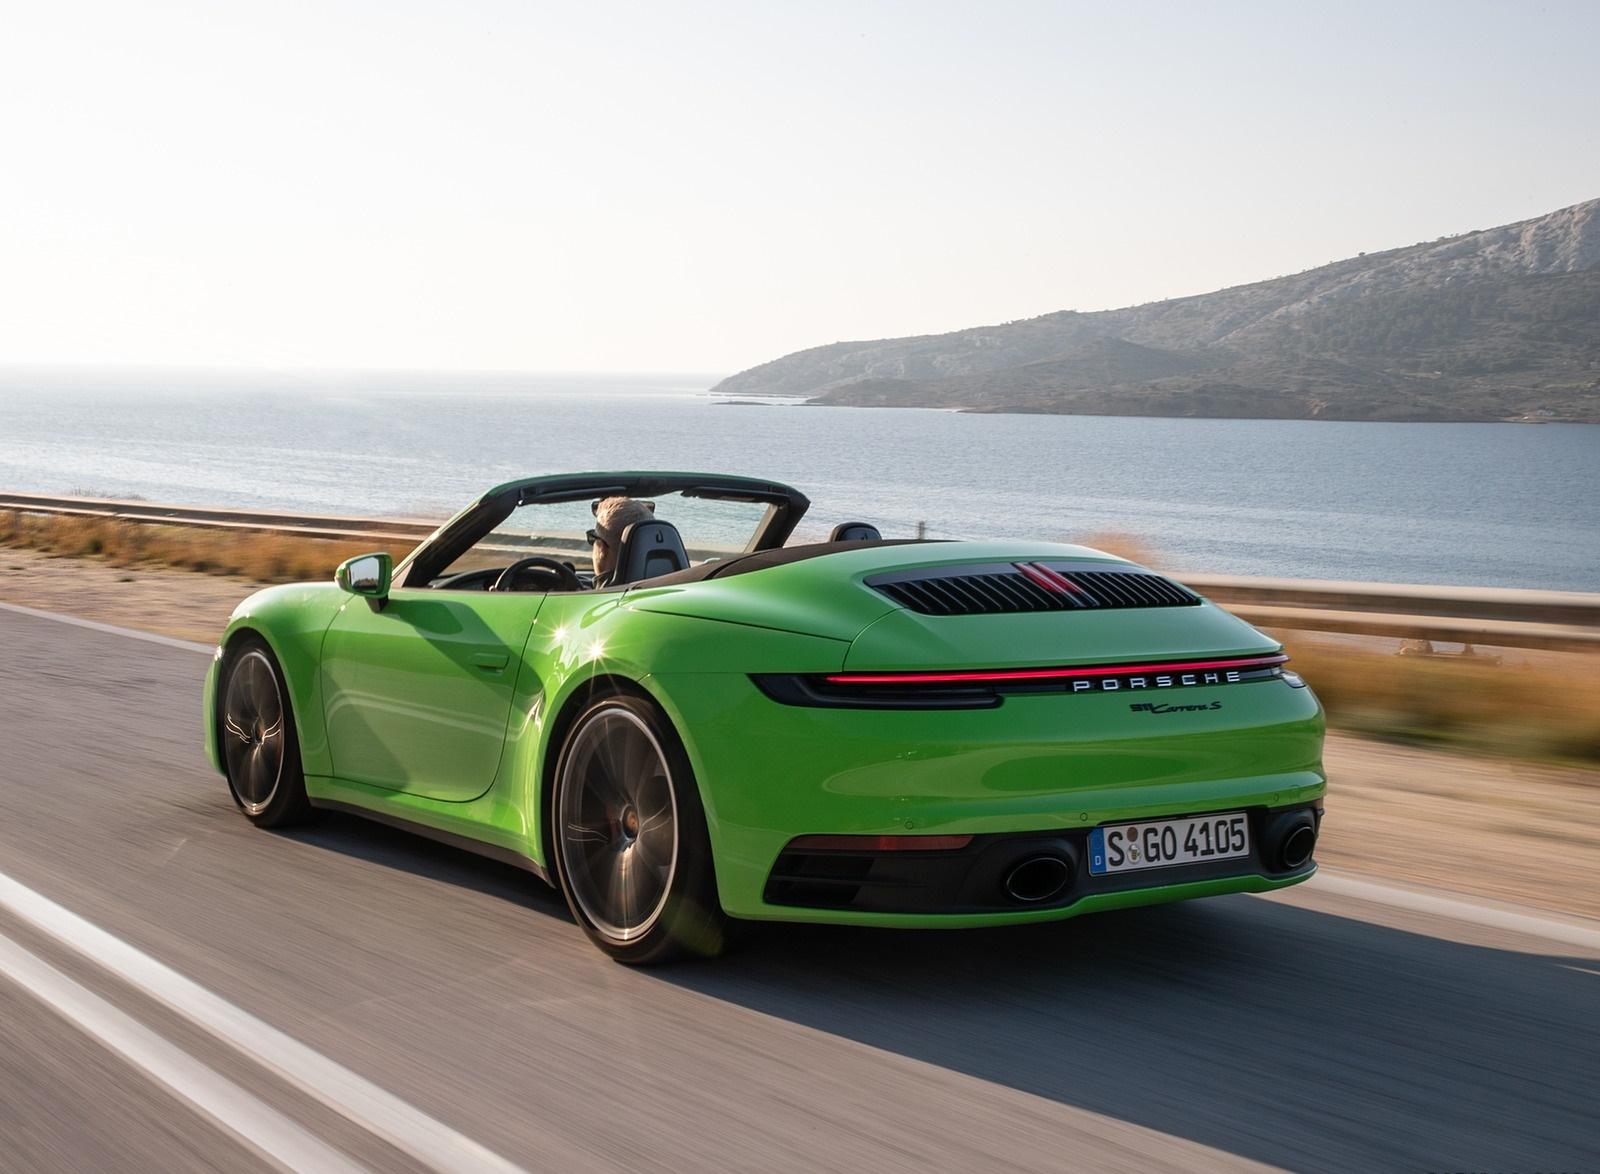 2020 Porsche 911 Carrera S Cabriolet Color Lizard Green Rear 1600x1174